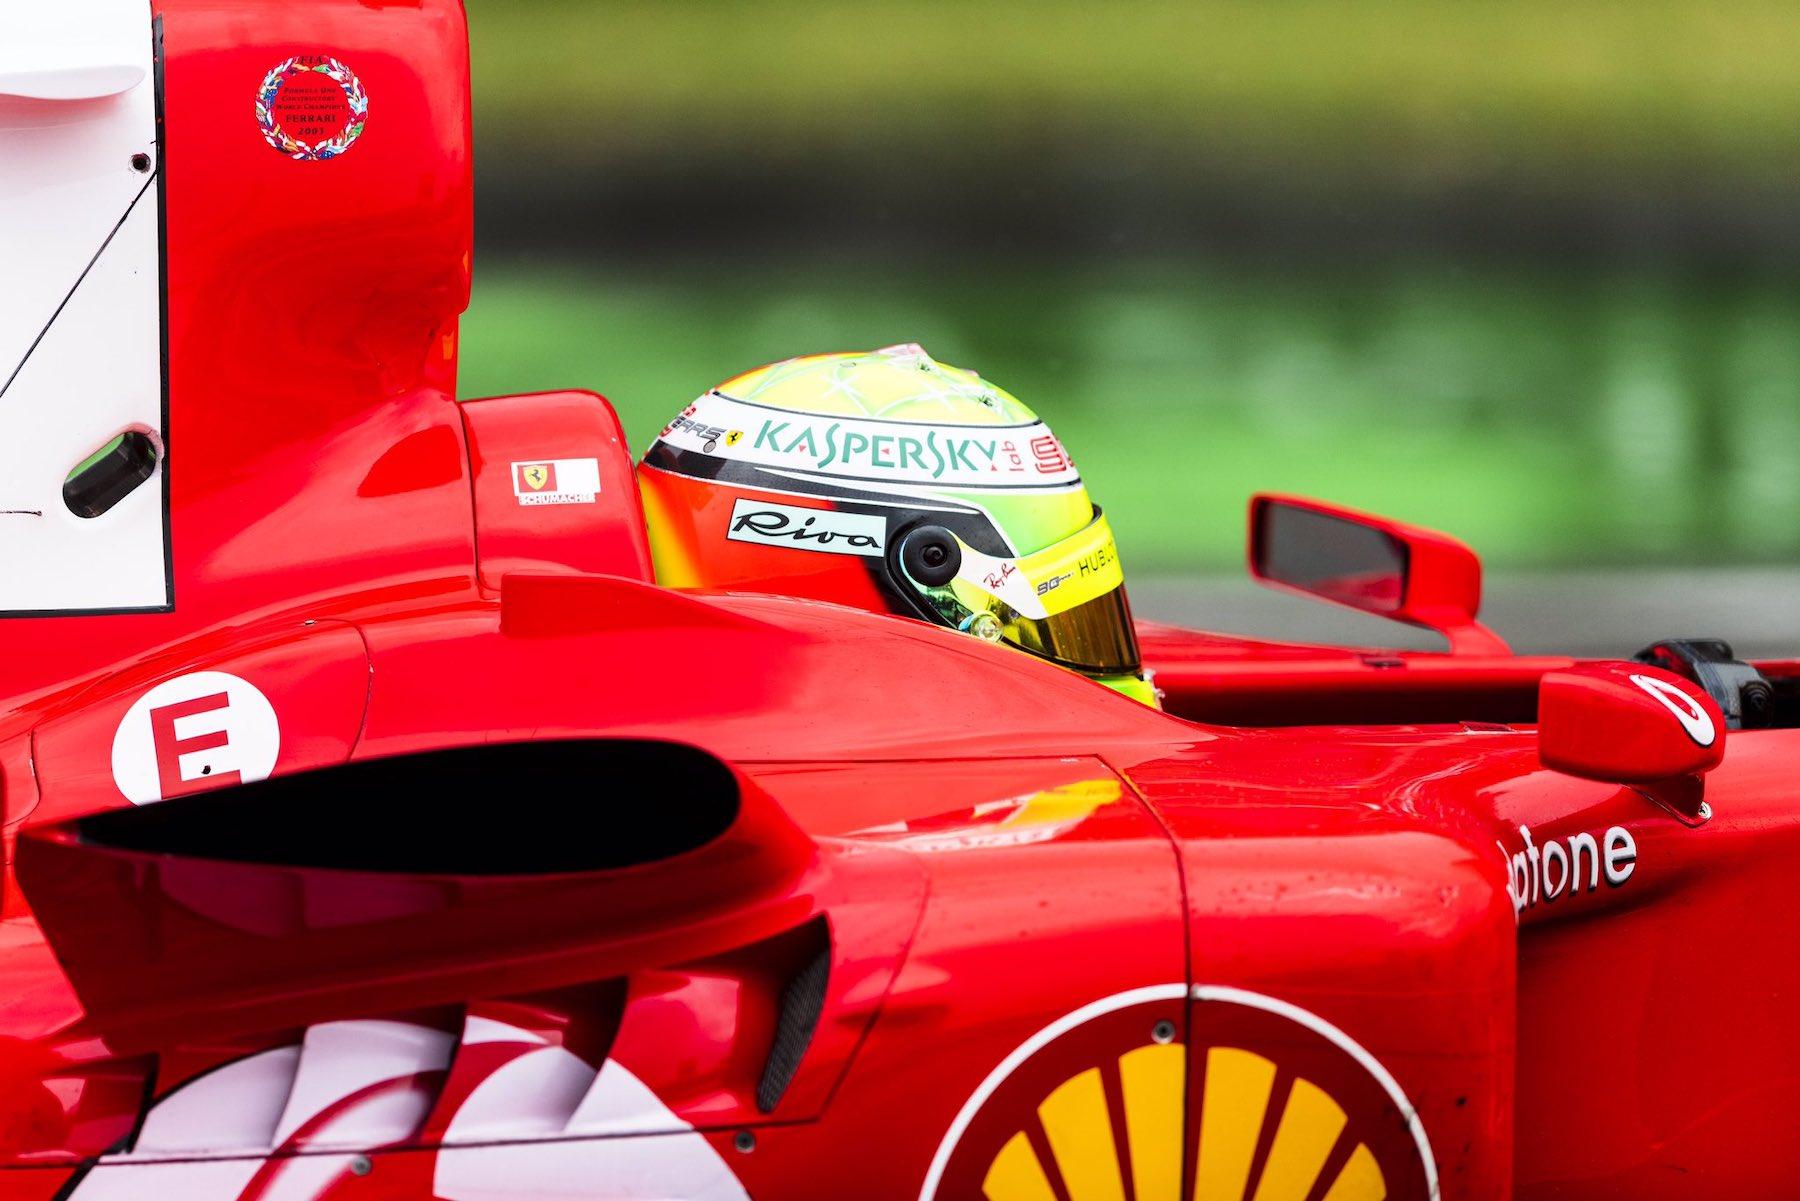 2019 Mick Schumacher | Ferrari F2004 | 2019 German GP 6 copy.jpg